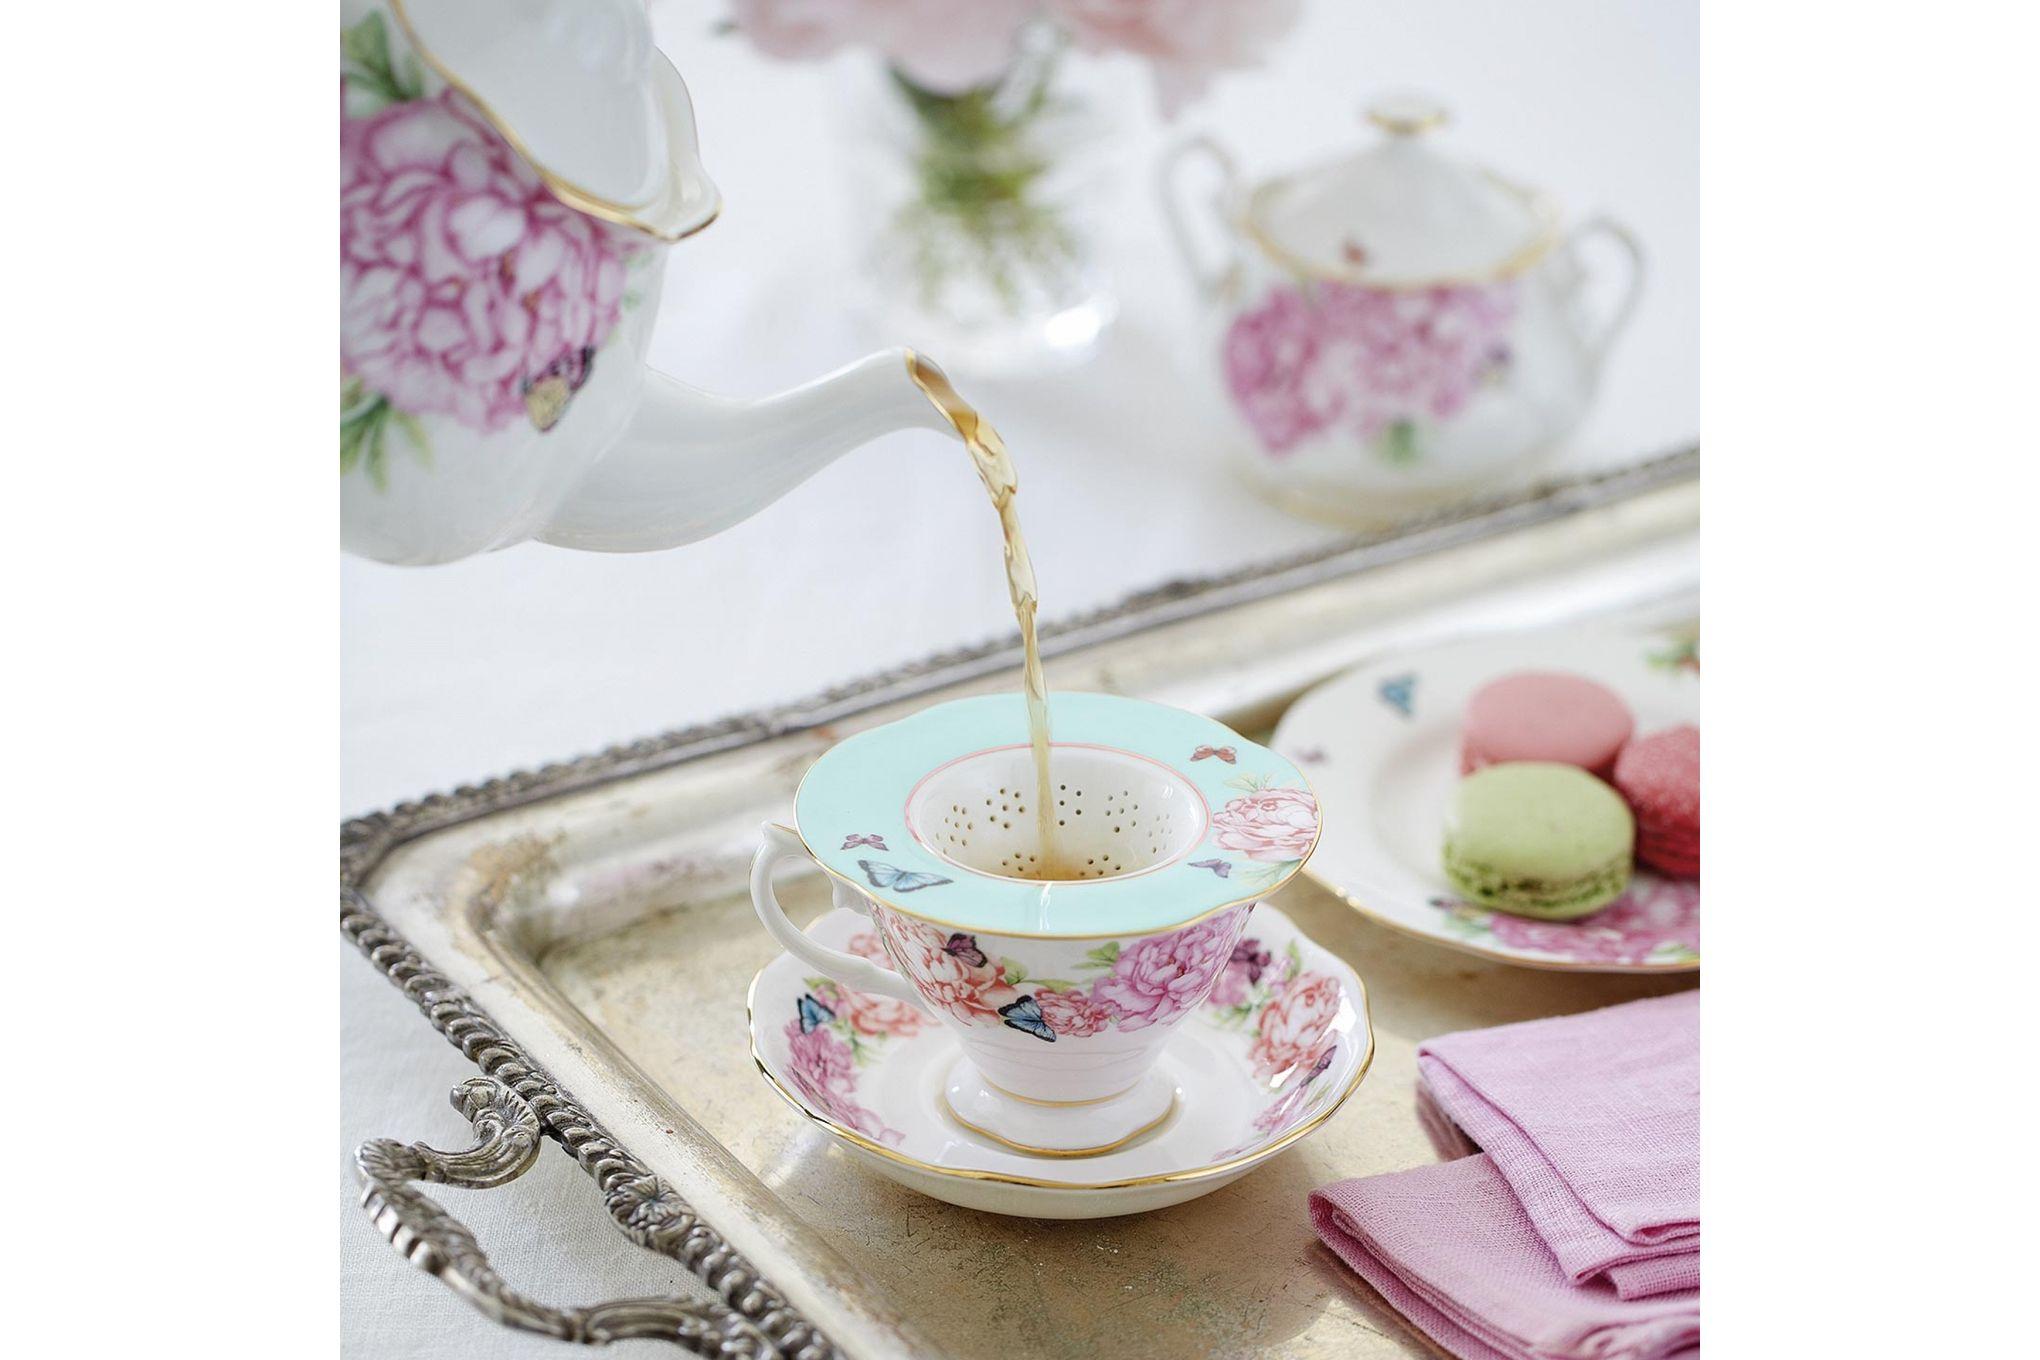 Miranda Kerr for Royal Albert Blessings Tea Strainer thumb 4